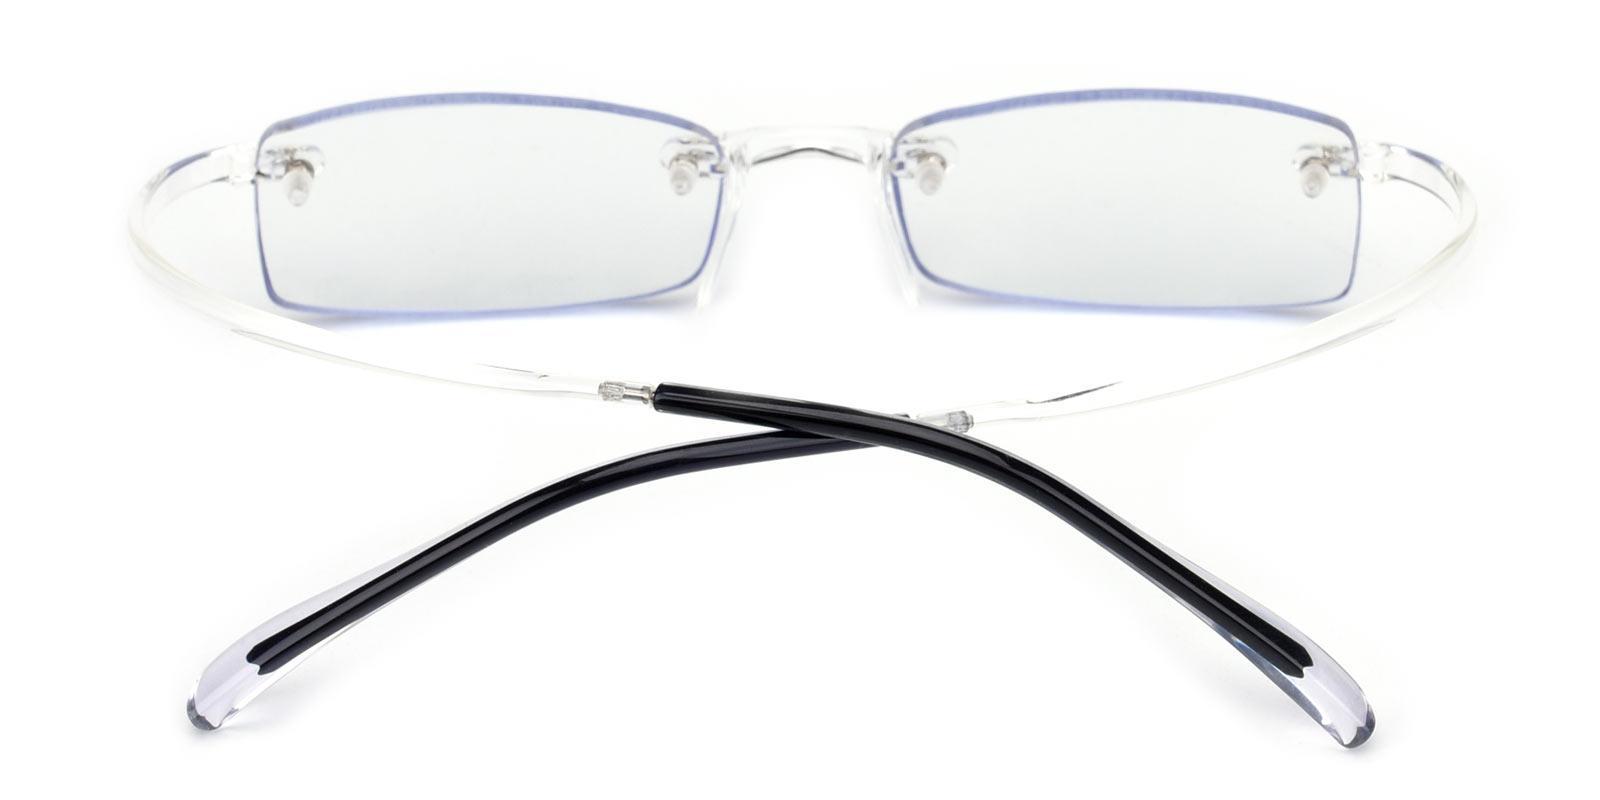 Hug-Translucent-Rectangle-Plastic-Eyeglasses-detail